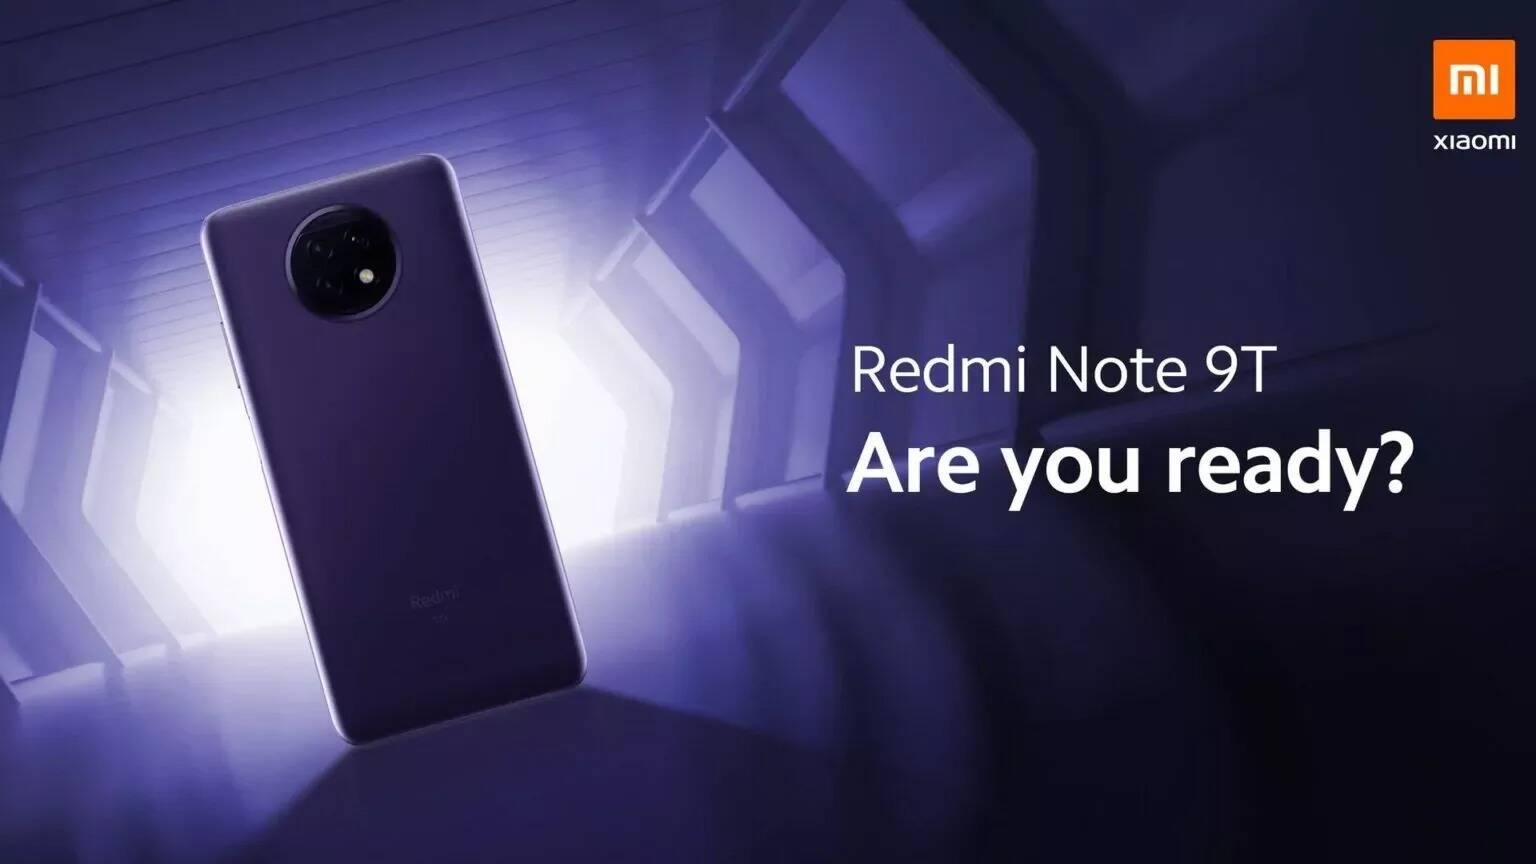 Redmi Note 9T 5G launch event